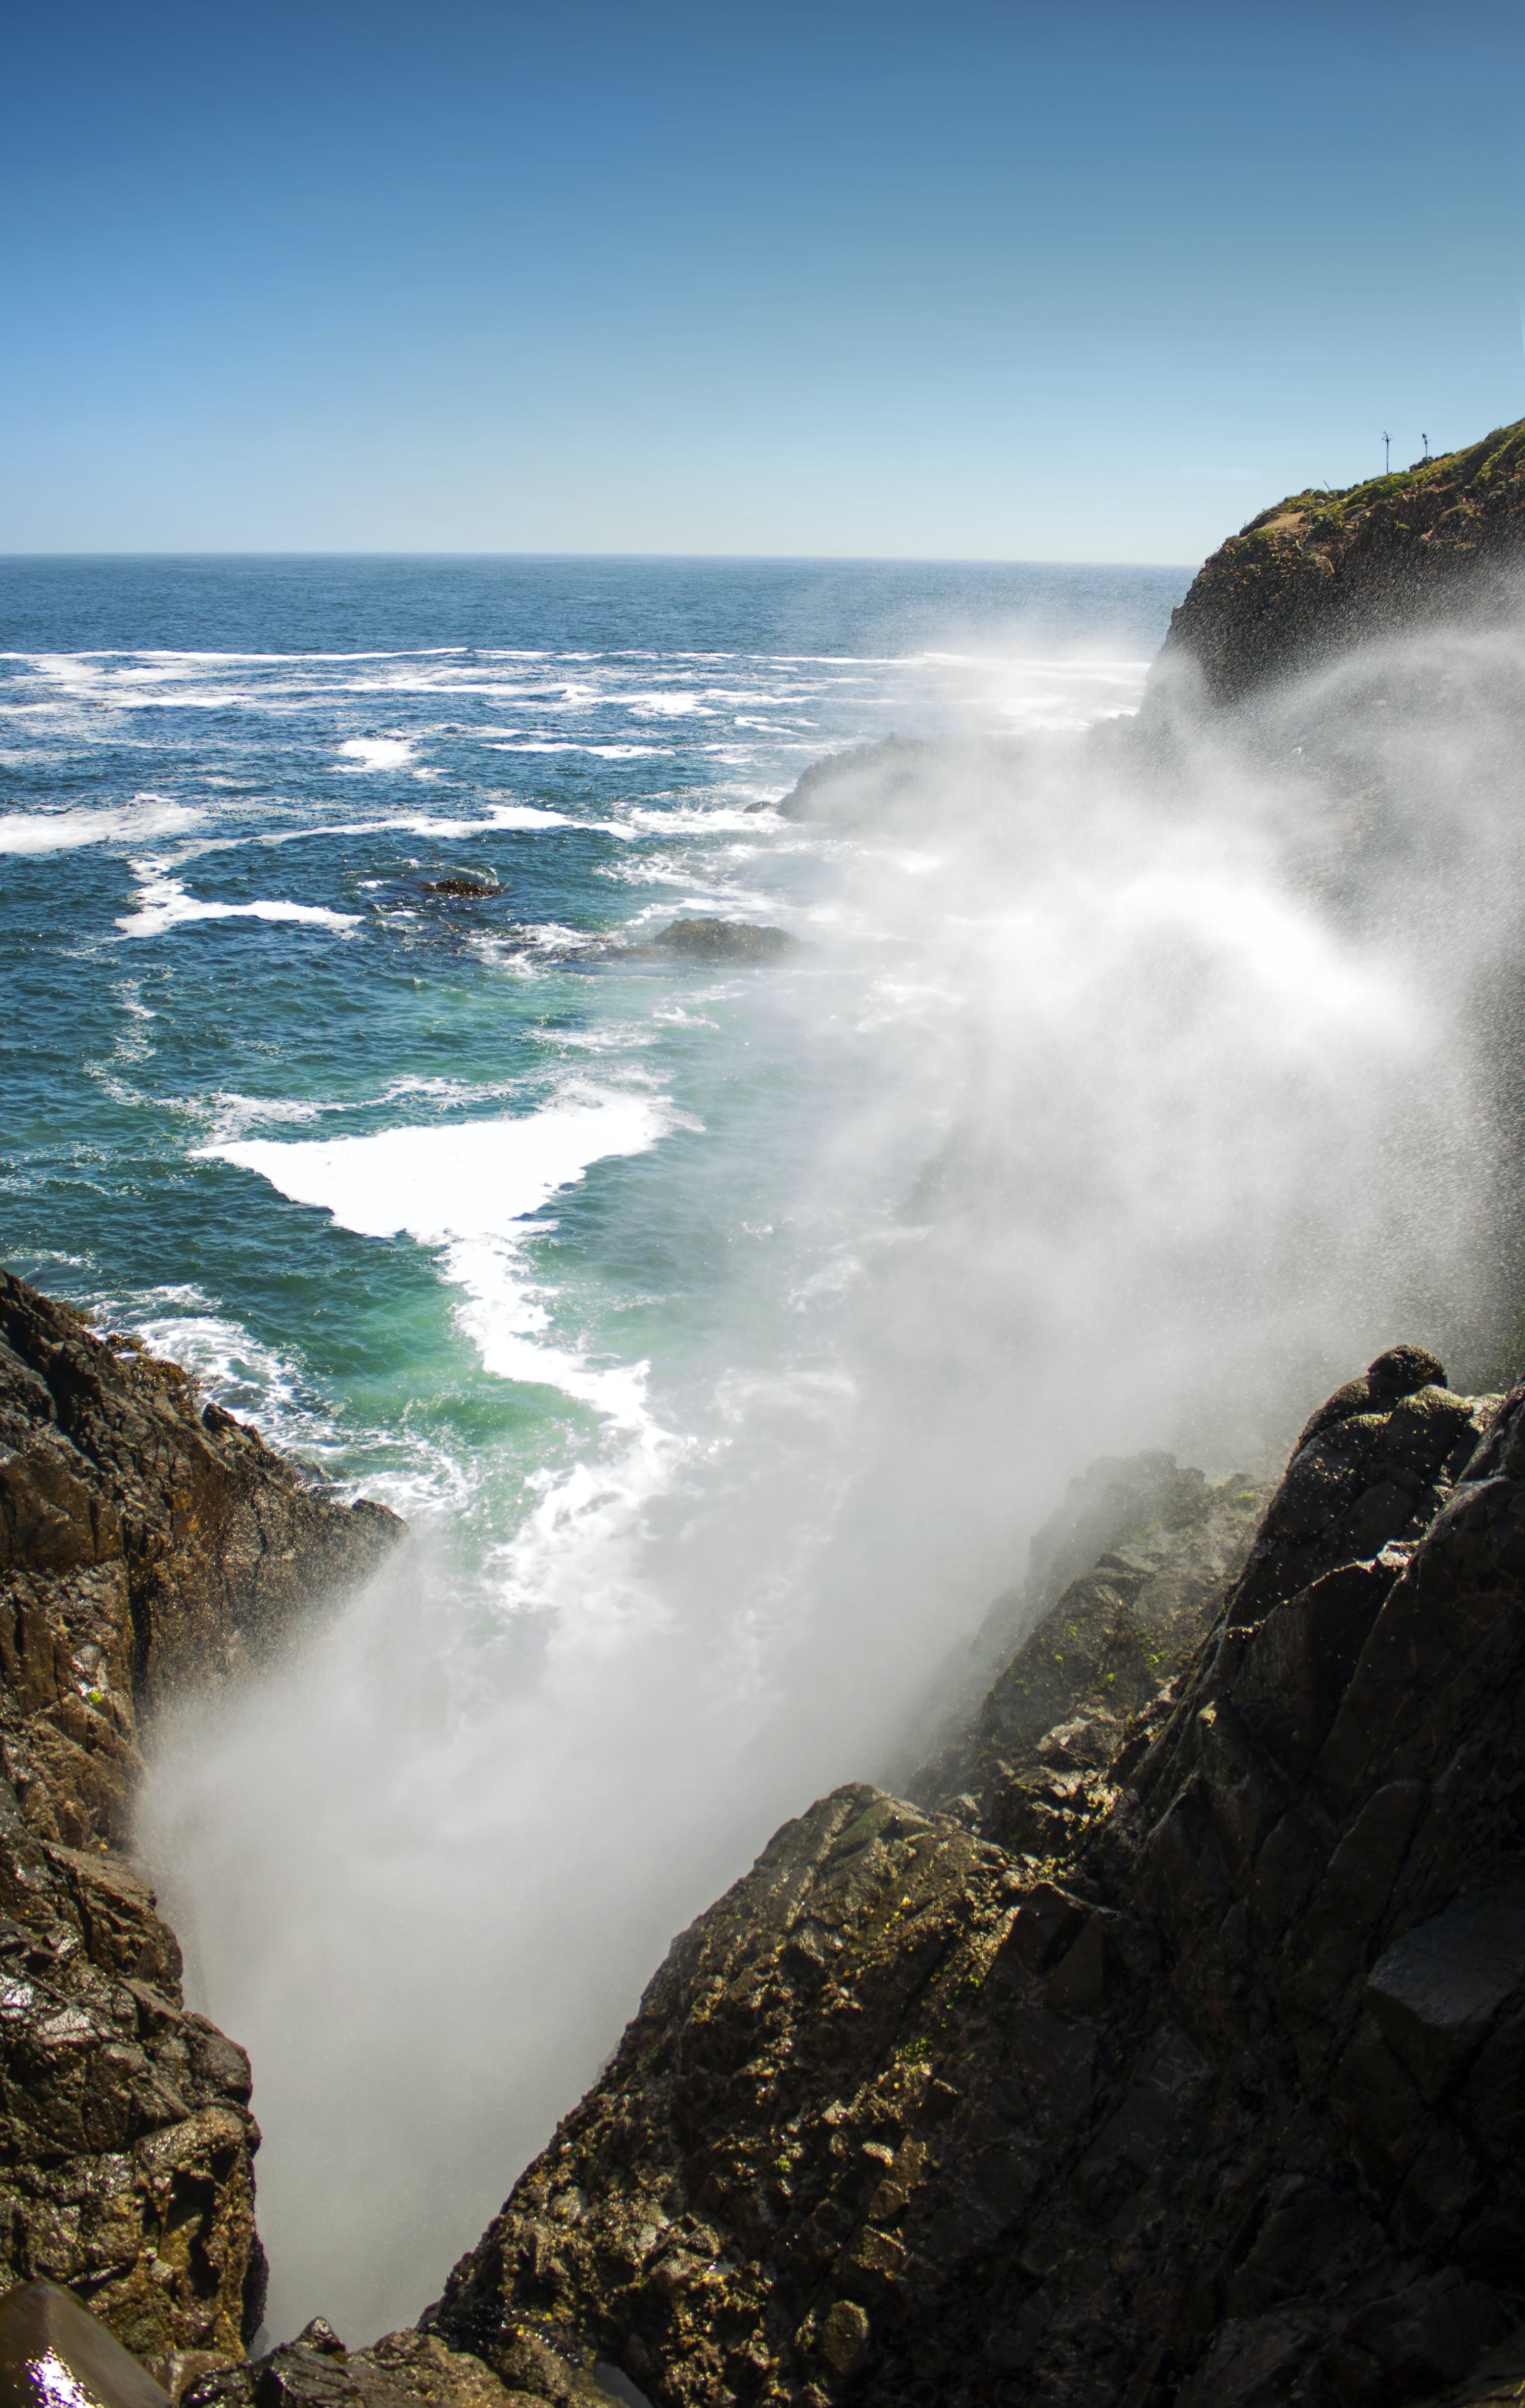 Безкоштовне стокове фото на тему «берег моря, бризкати, високий, вода»